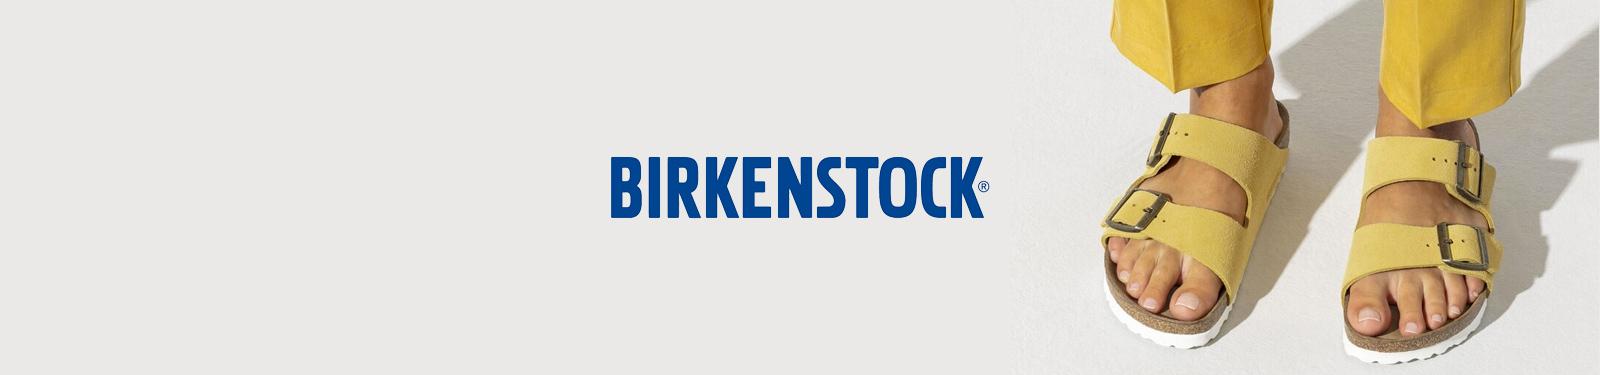 birk-spring-brand-banner-2020.jpg